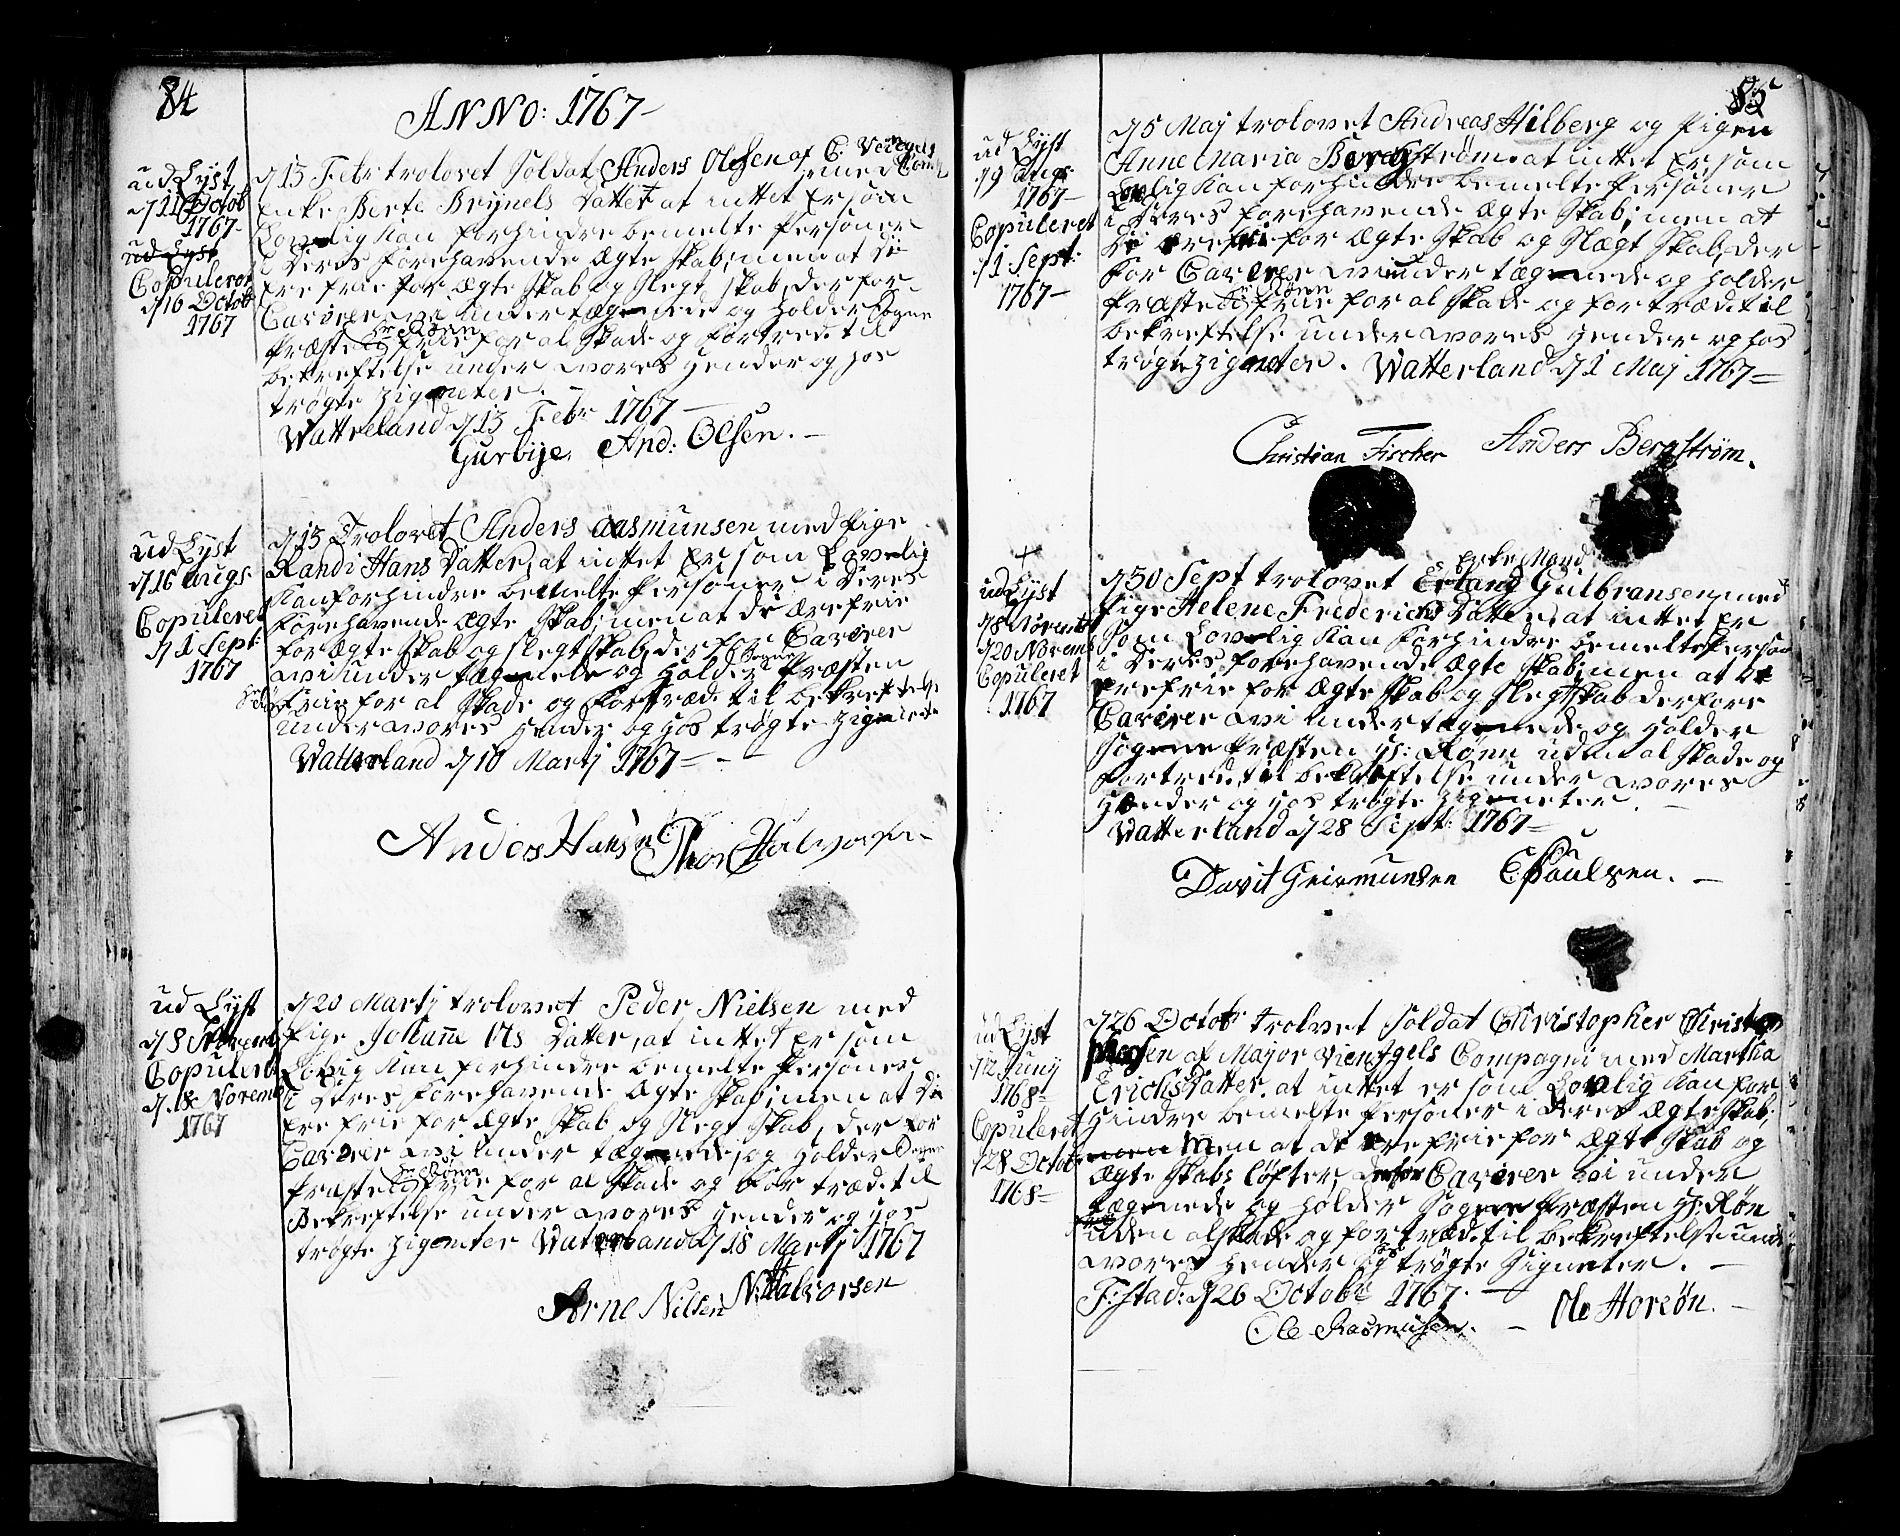 SAO, Fredrikstad prestekontor Kirkebøker, F/Fa/L0002: Ministerialbok nr. 2, 1750-1804, s. 84-85